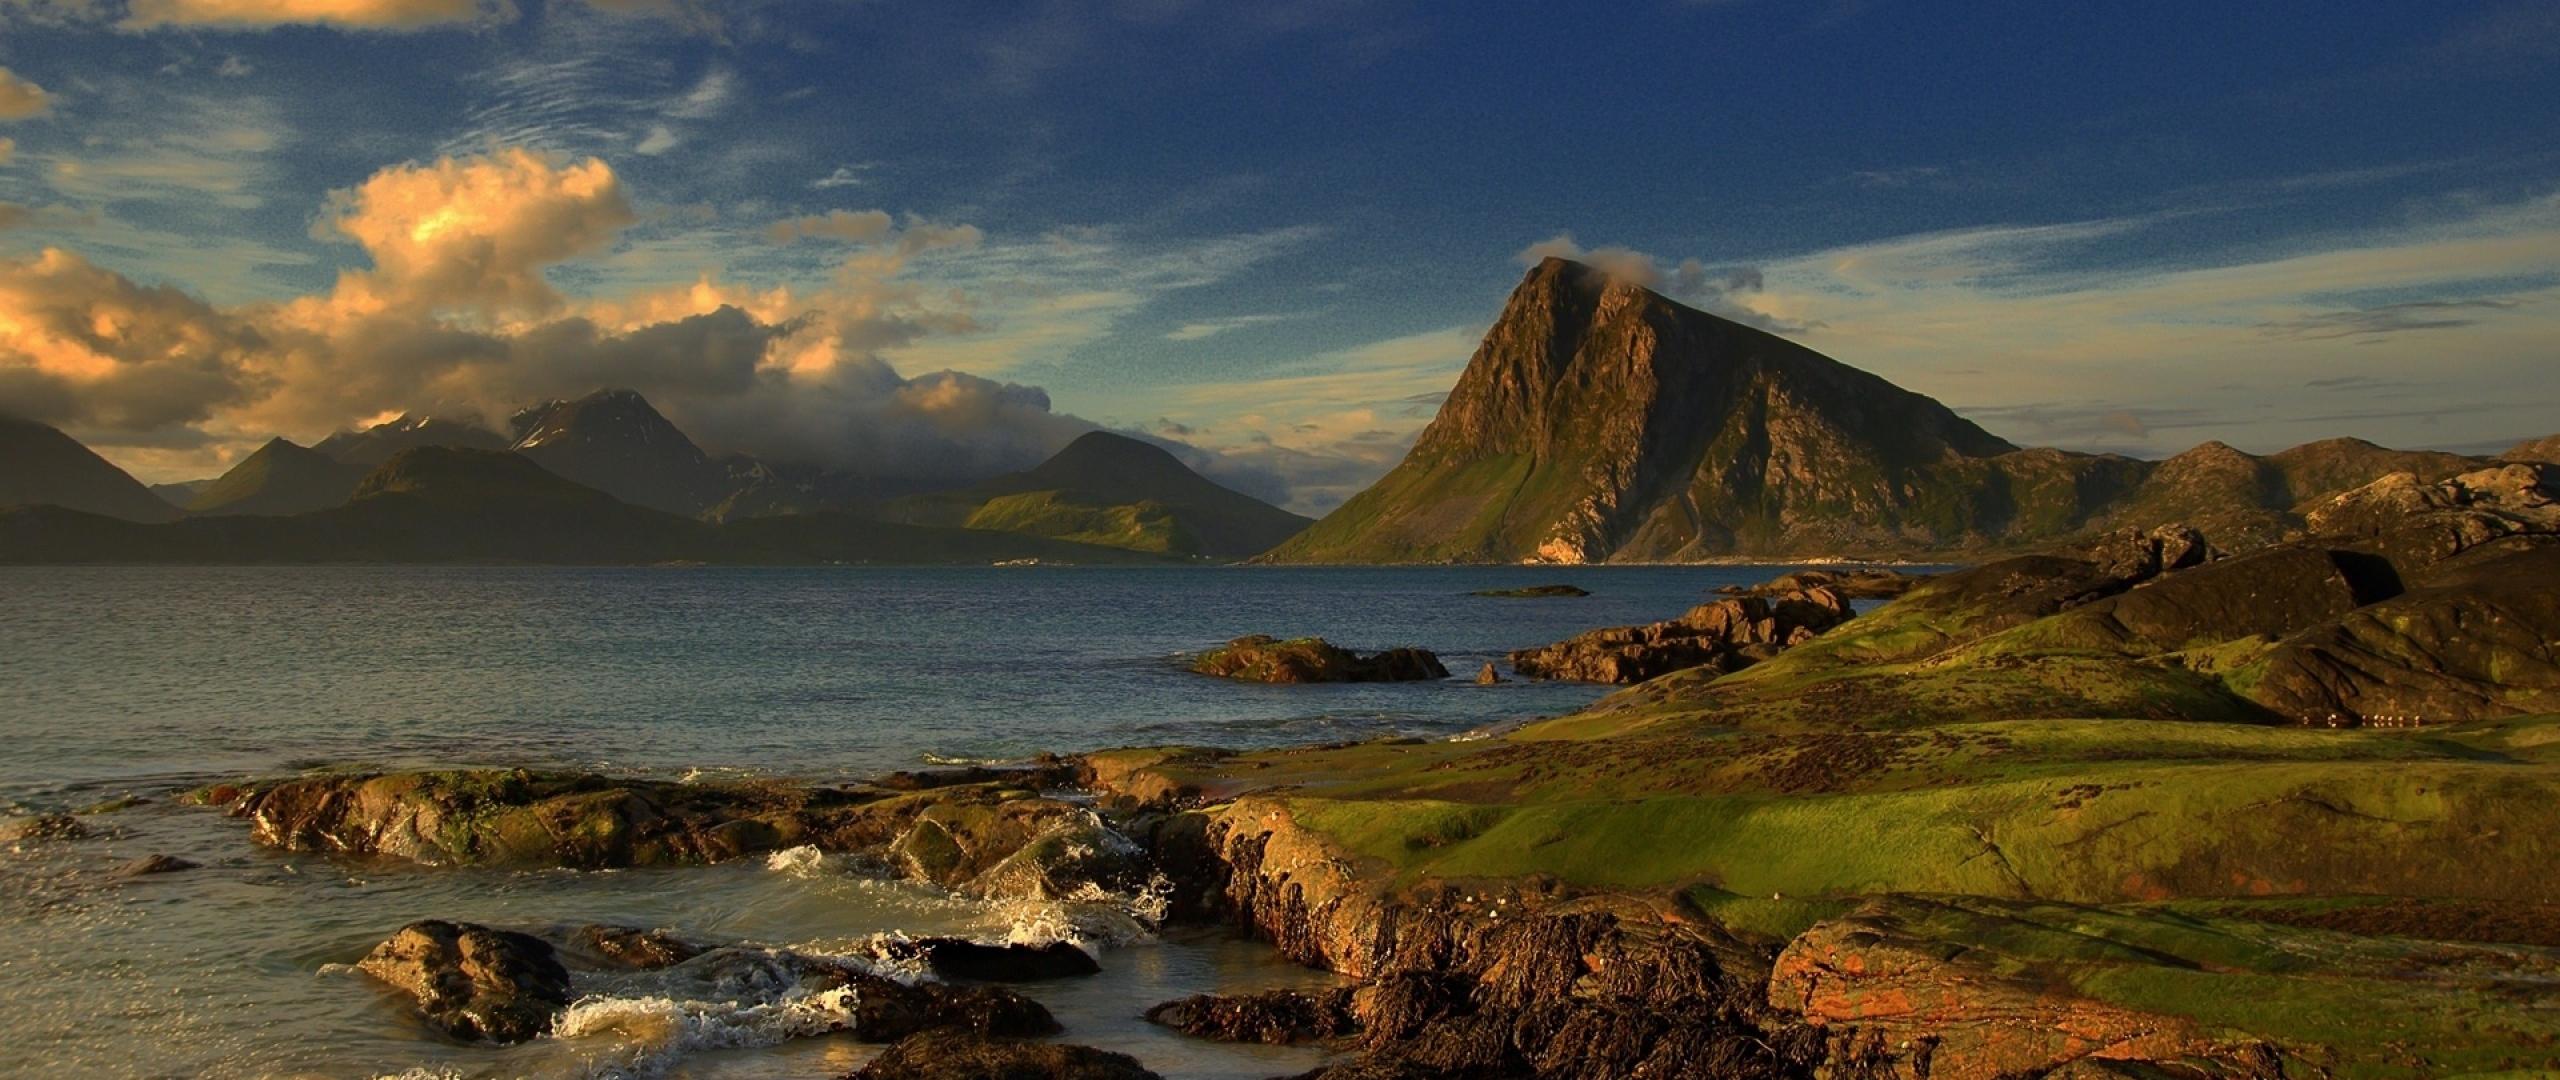 2560x1080 Wallpaper land coast sea mountain slopes wave sky 2560x1080